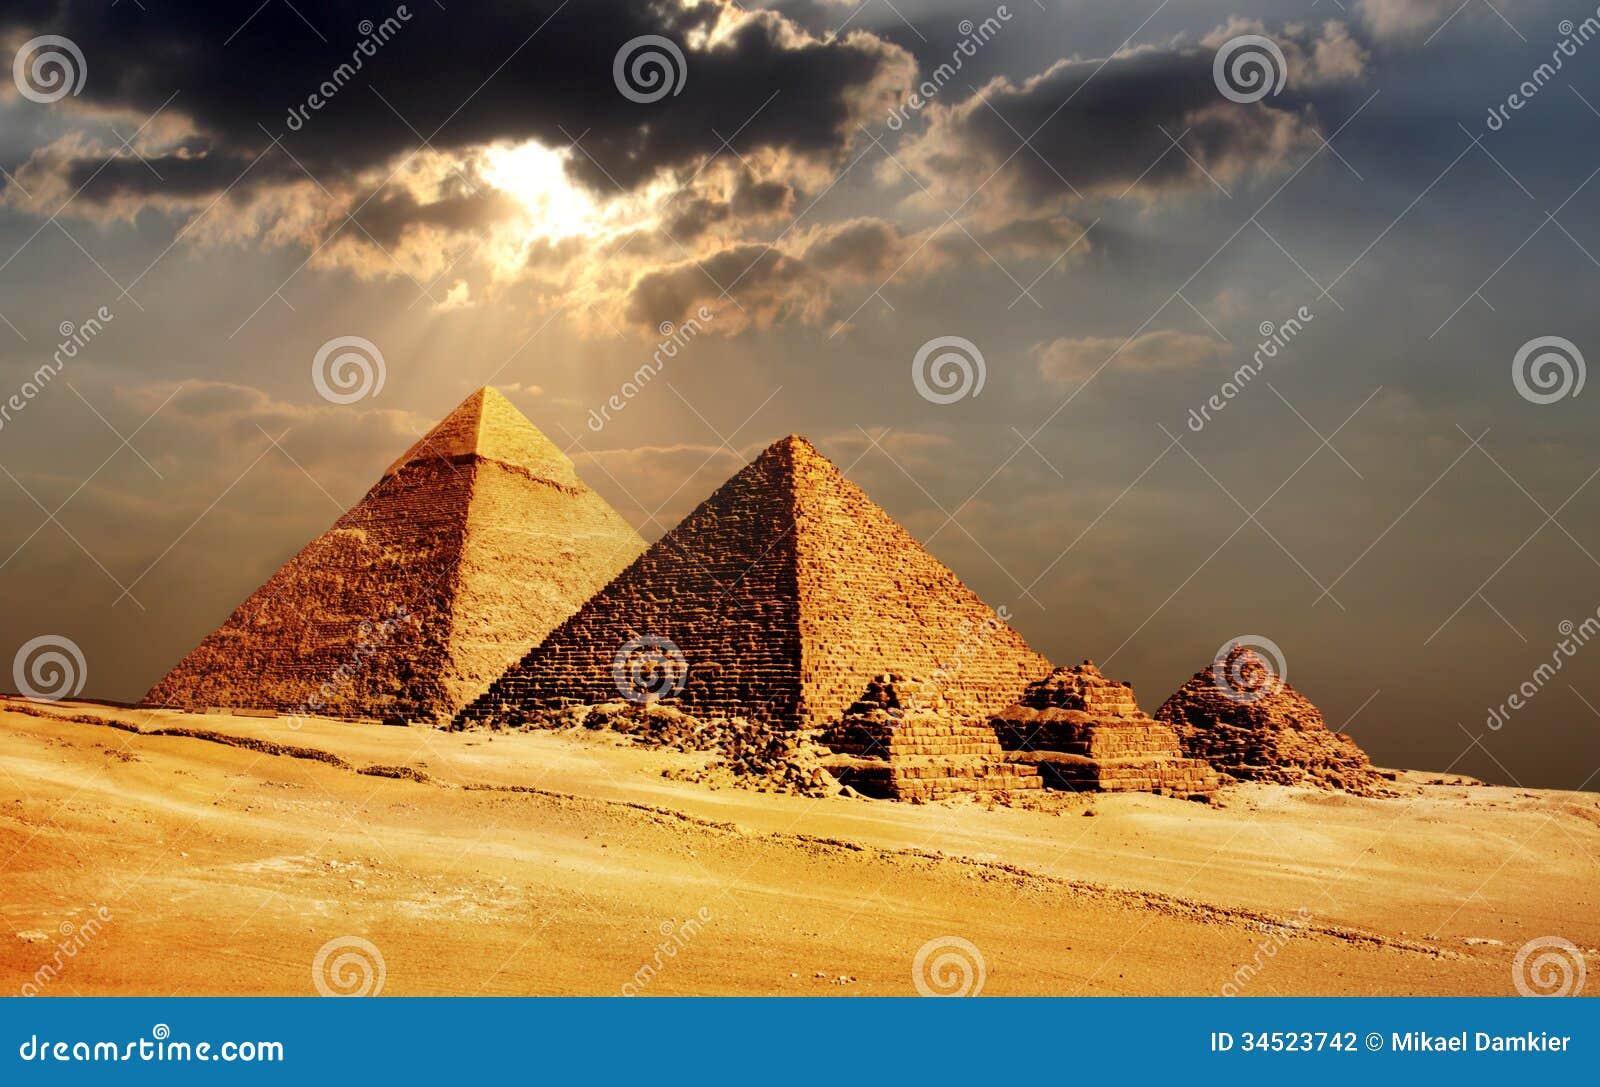 Download Giza Pyramids, Cairo, Egypt Stock Photo - Image of history, exterior: 34523742